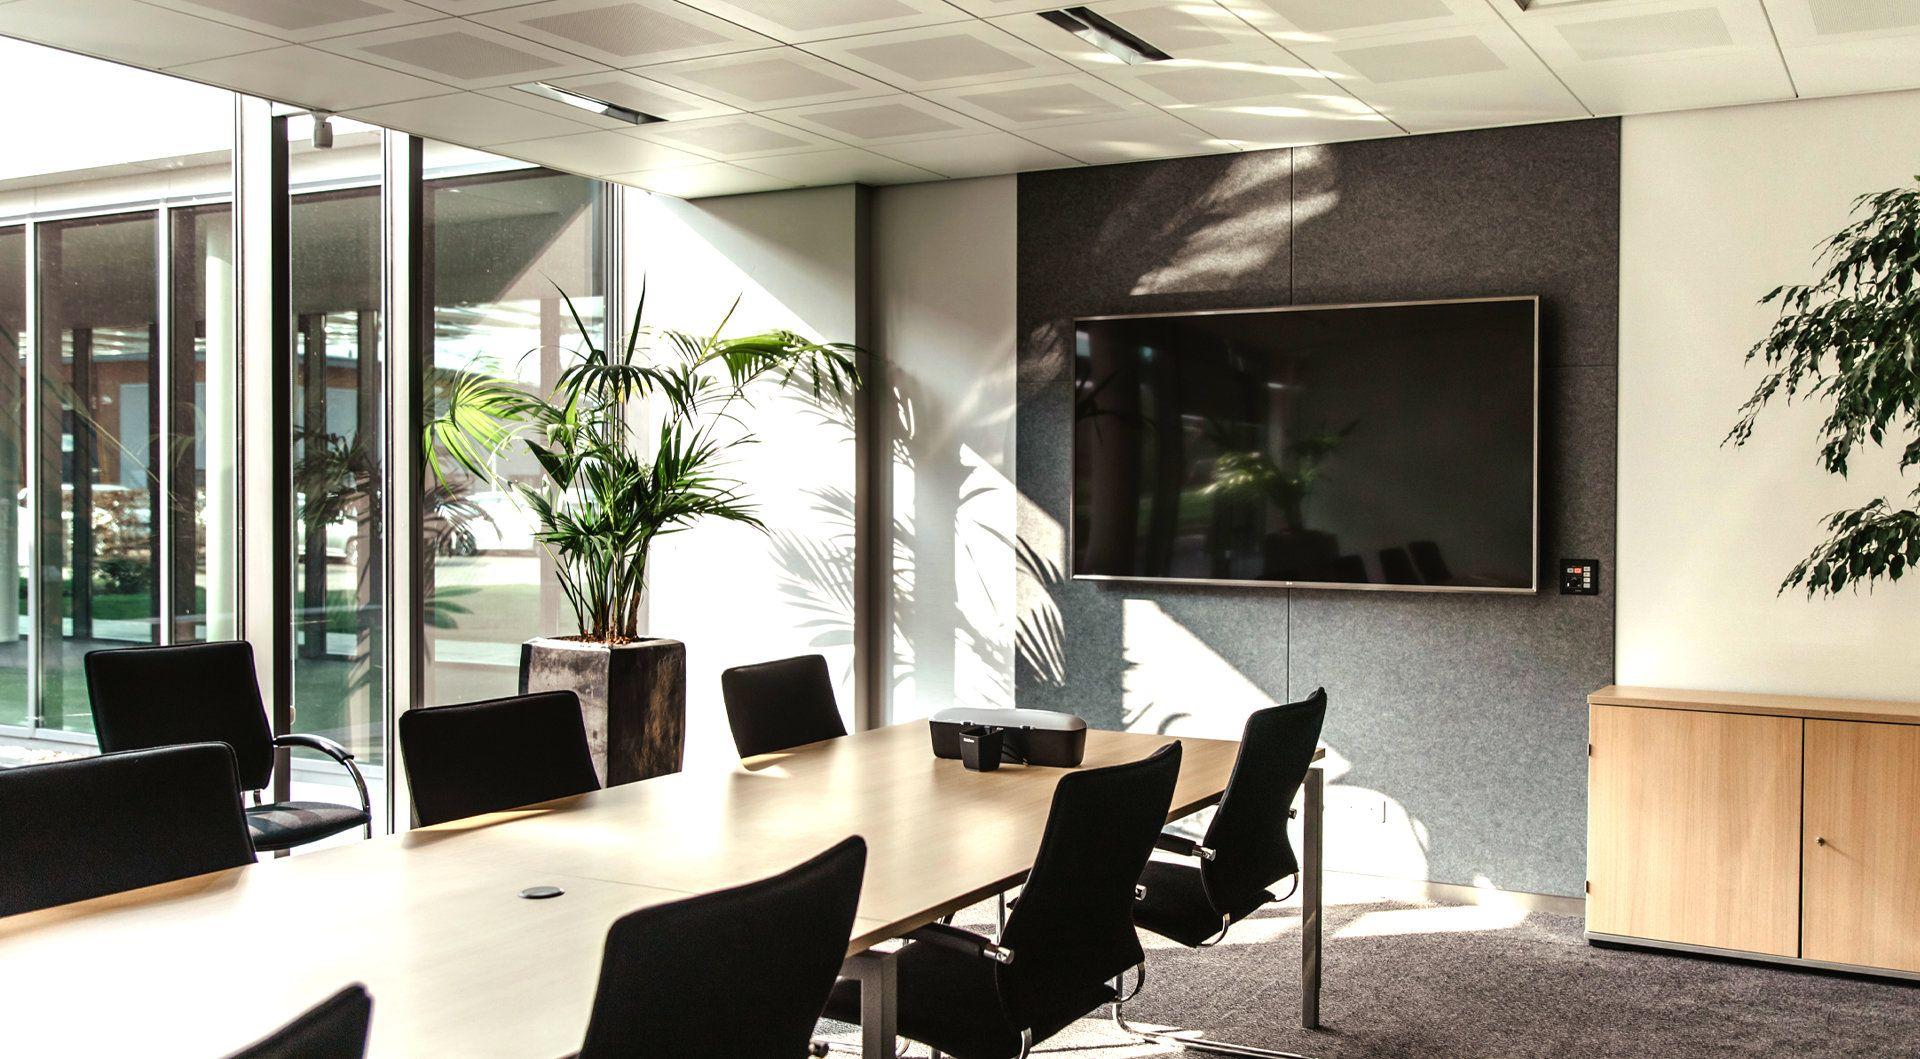 "Chief MF1UB flat panel vloer standaard 165,1 cm (65"") Vaste flatscreen vloerstandaard Zwart - Case studie de vries"